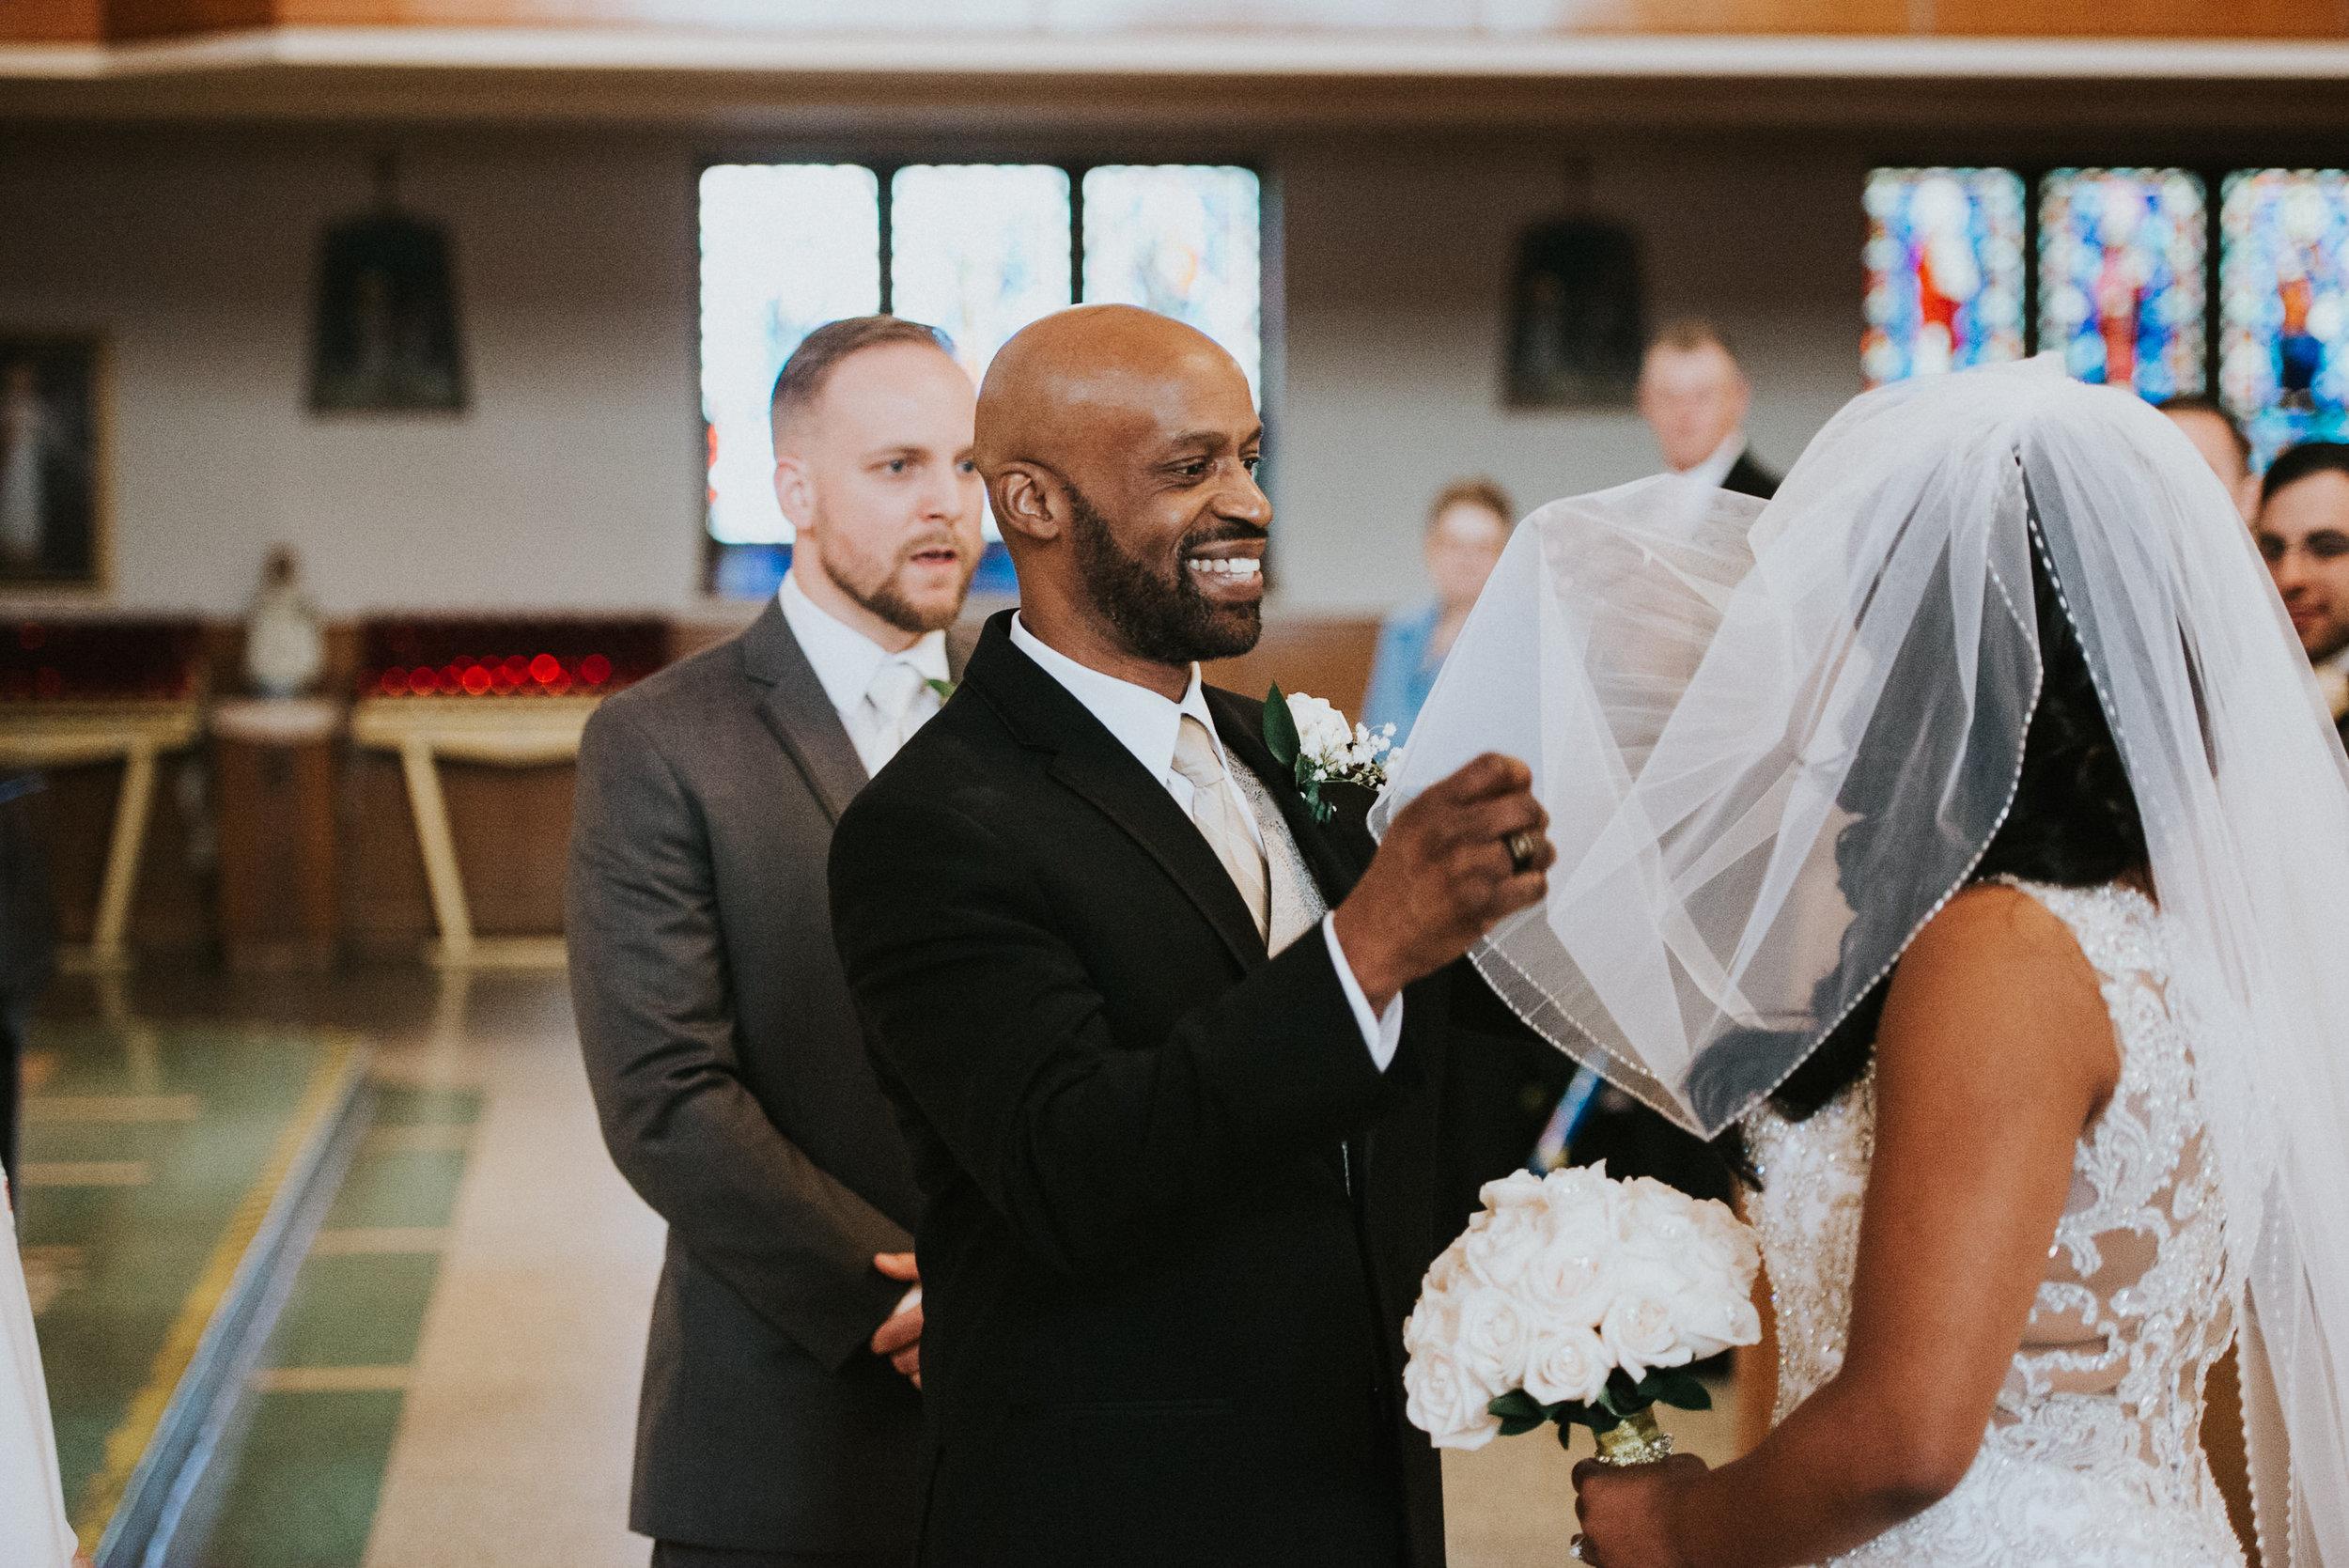 Tiana-and-Danny-Wedding-371.jpg